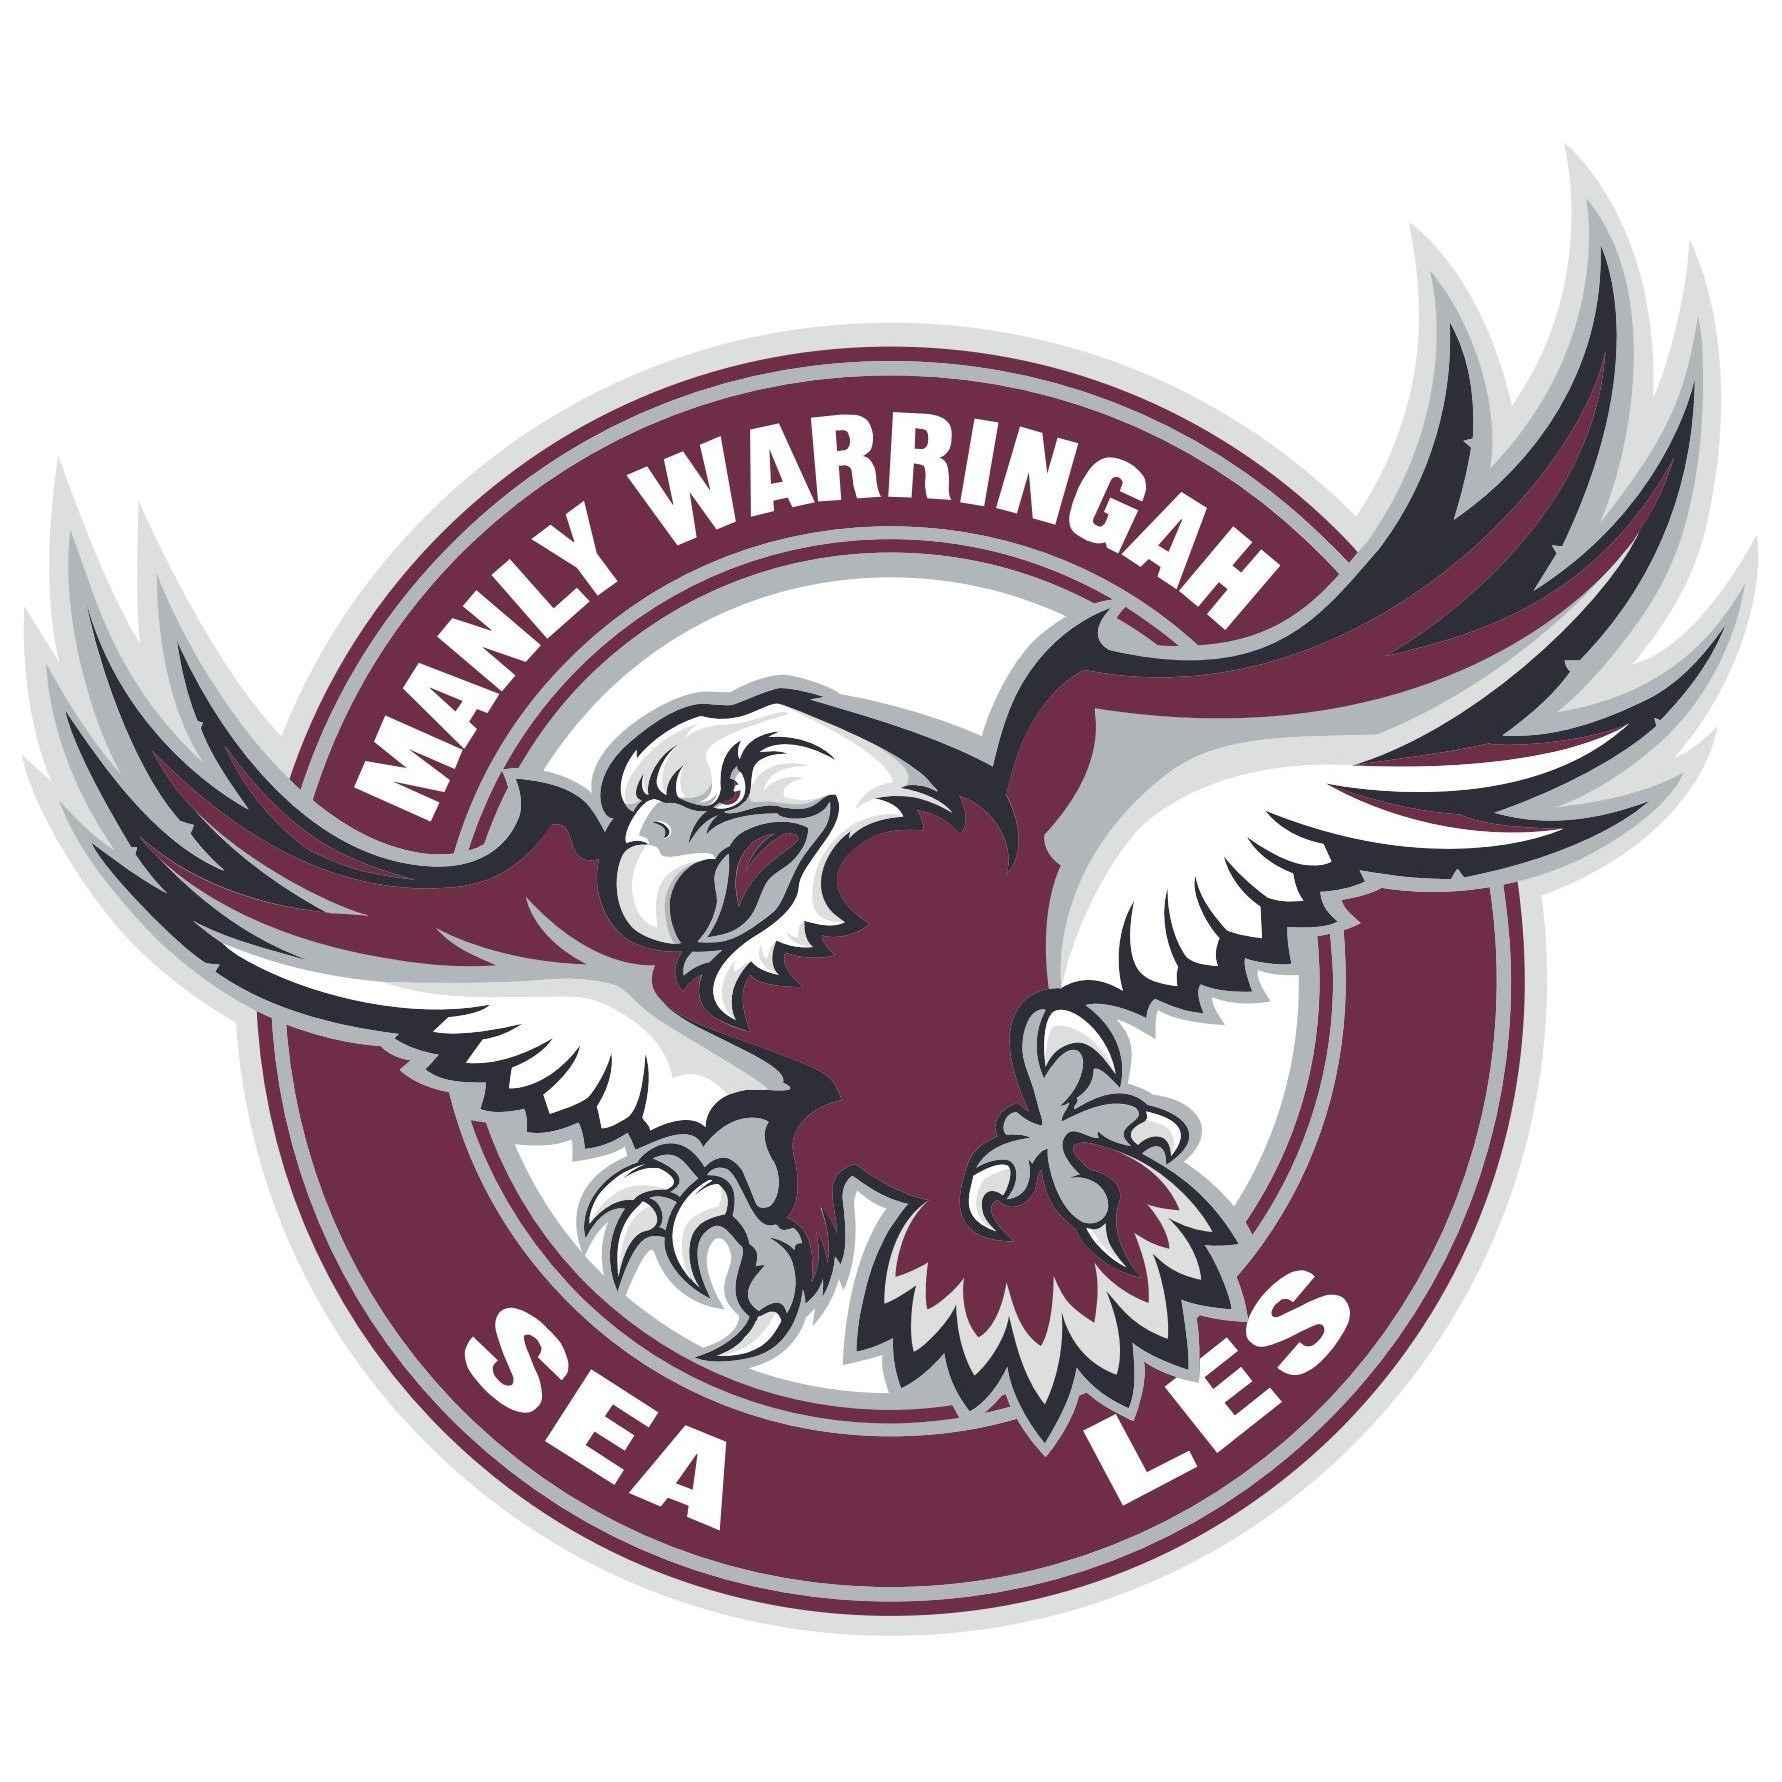 Manly-Warringah_Sea_Eagles_logo